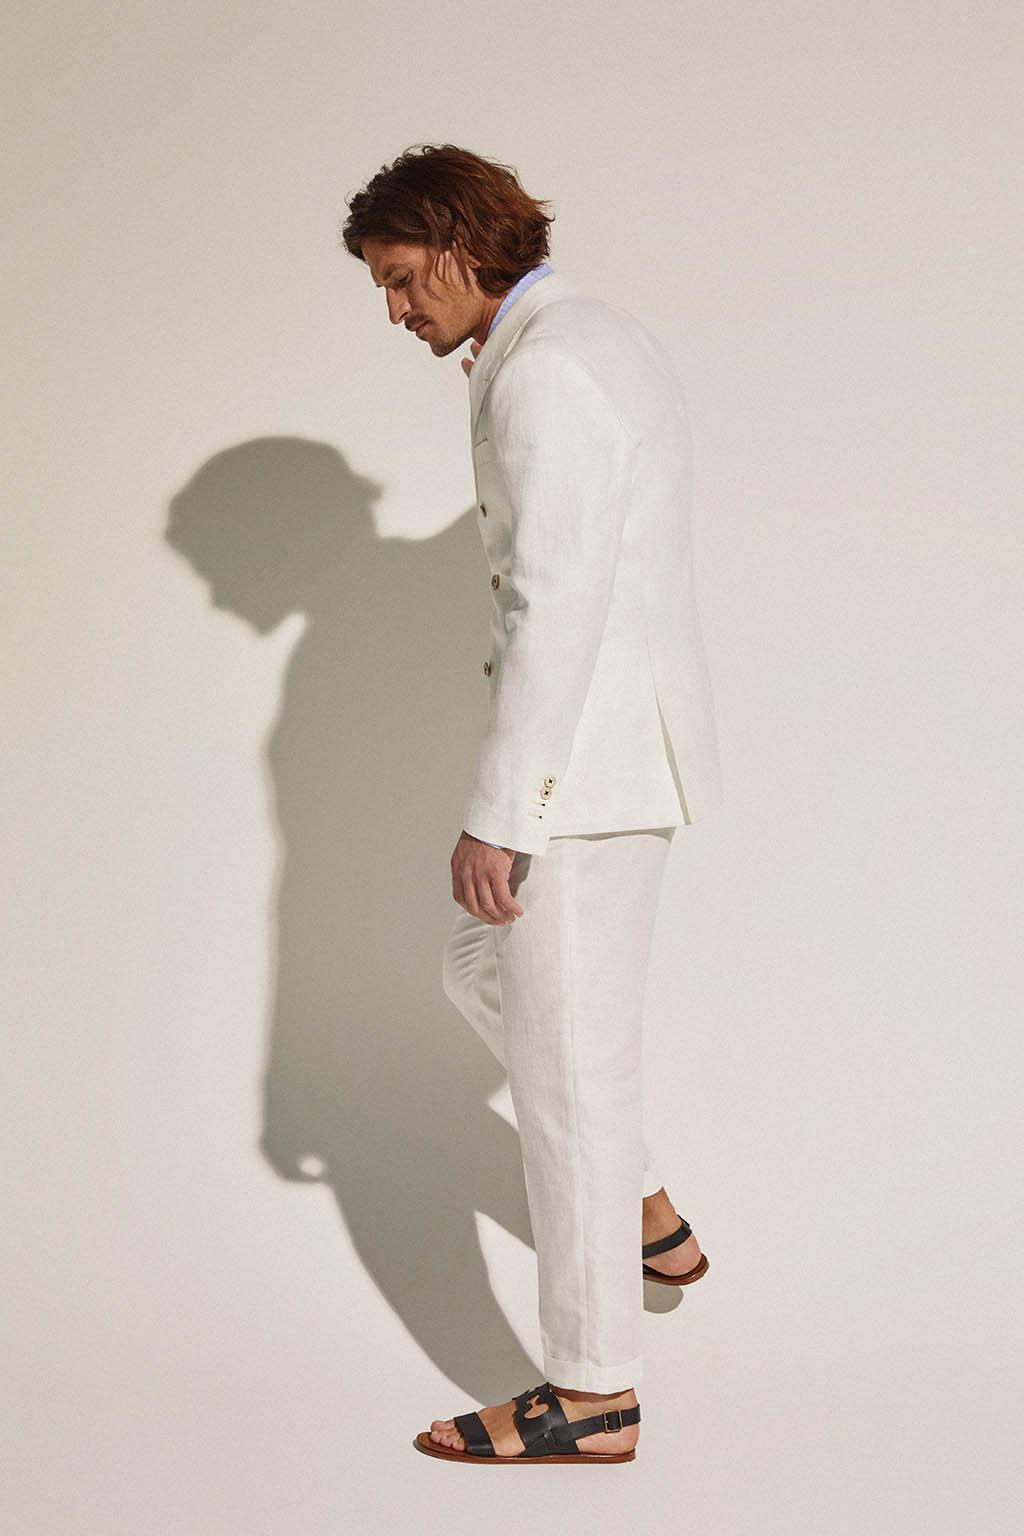 CH Carolina Herrera. New Menswear Collection Capsule Collection. Look 02